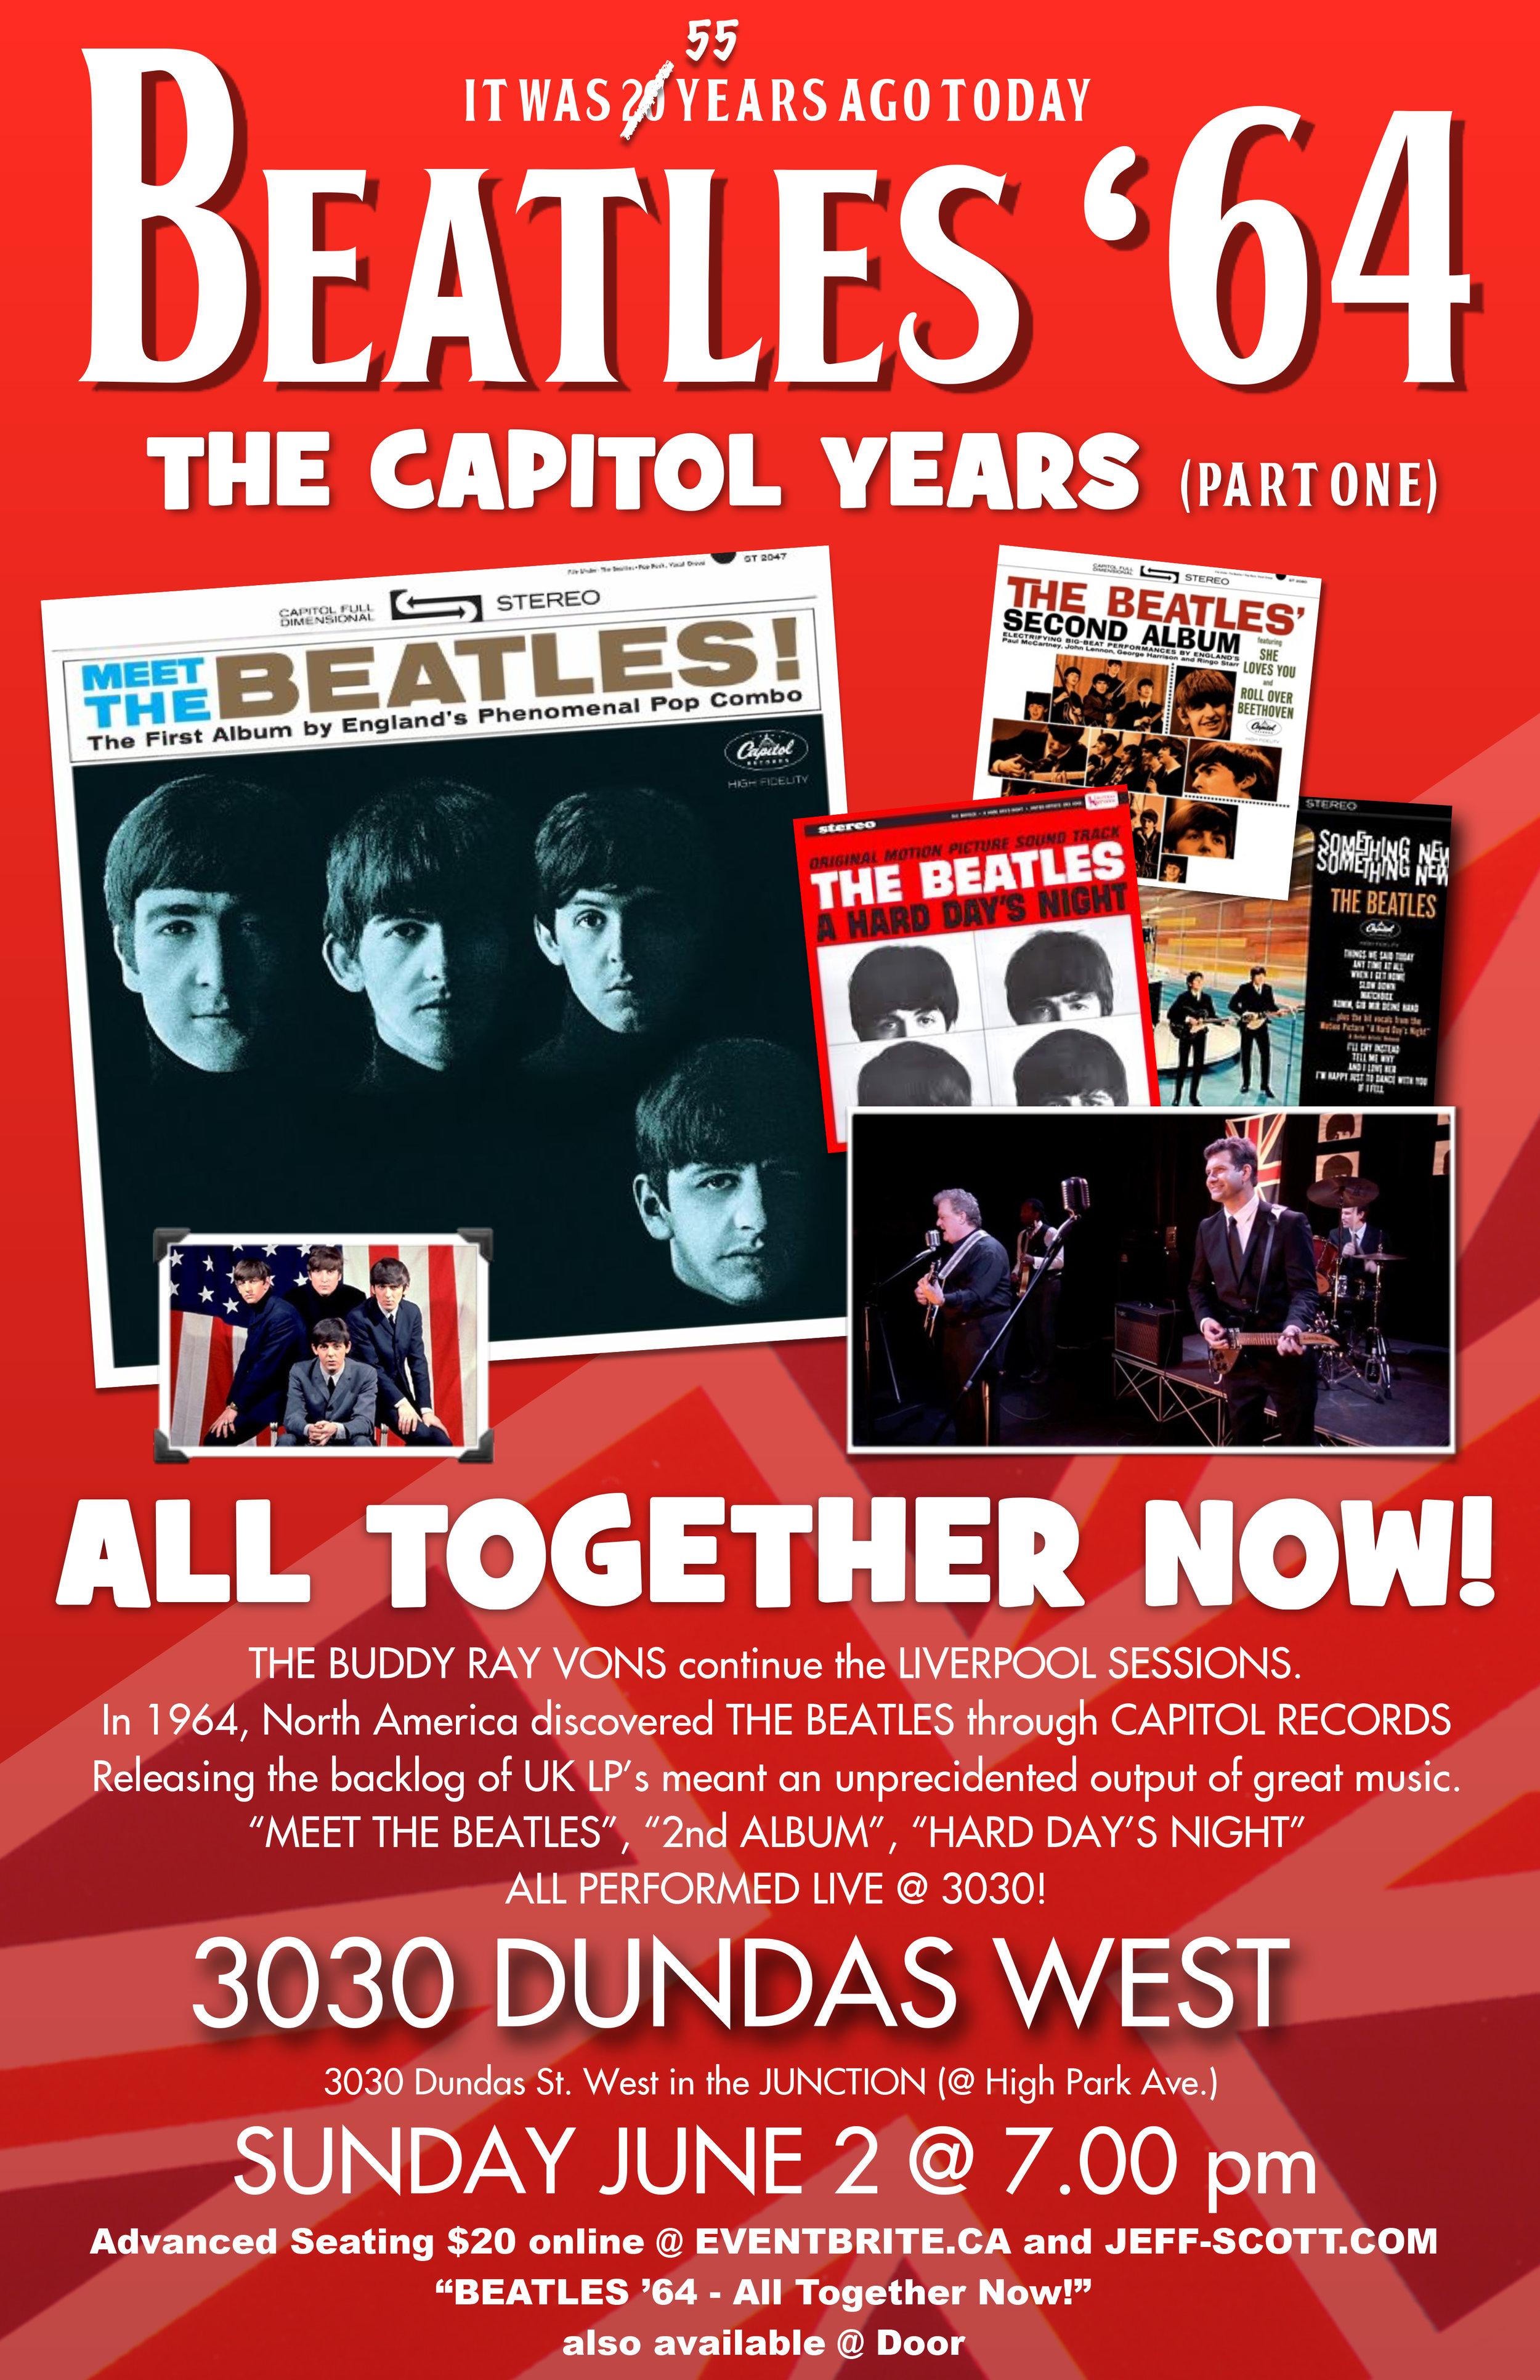 Beatle 64 3030.jpg